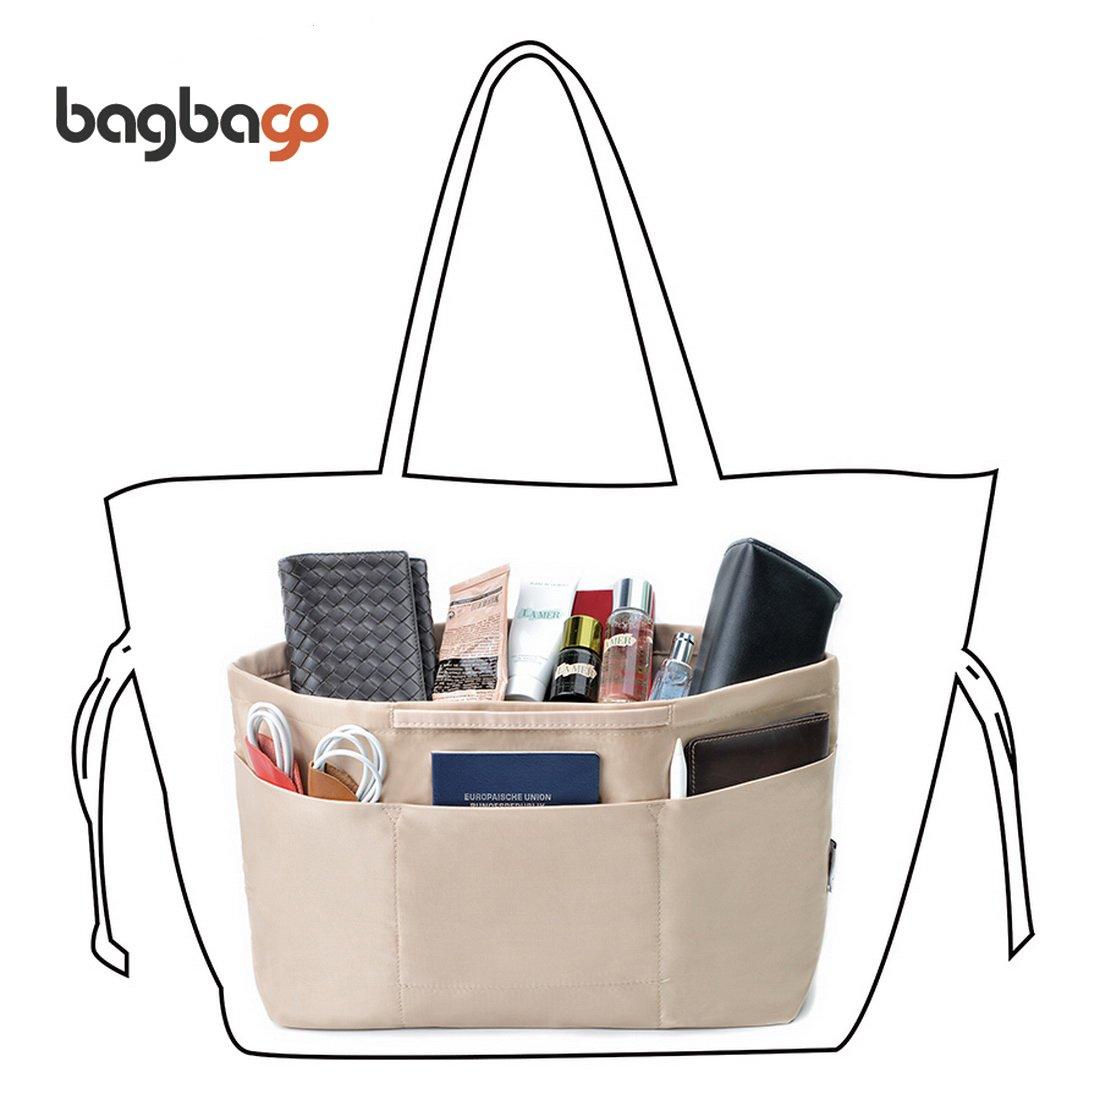 BES CHAN 13 Pockets Handbag Organizer Liner Bag in Bag with Anti-Theft Keychain (M,Khaki)